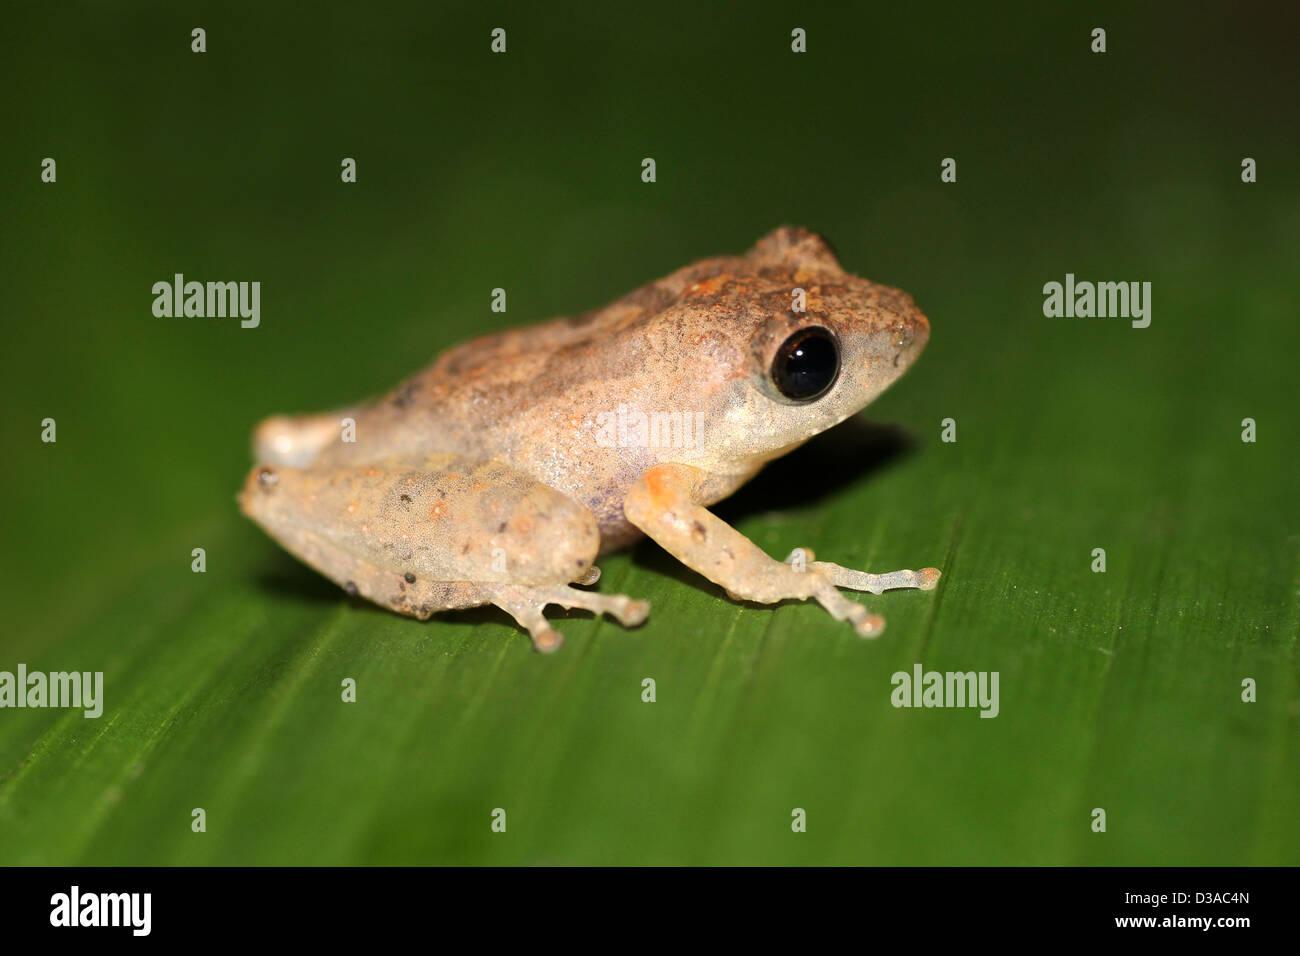 Peeling-Frosch - Philautus Rus Taken in der Nacht Stockbild